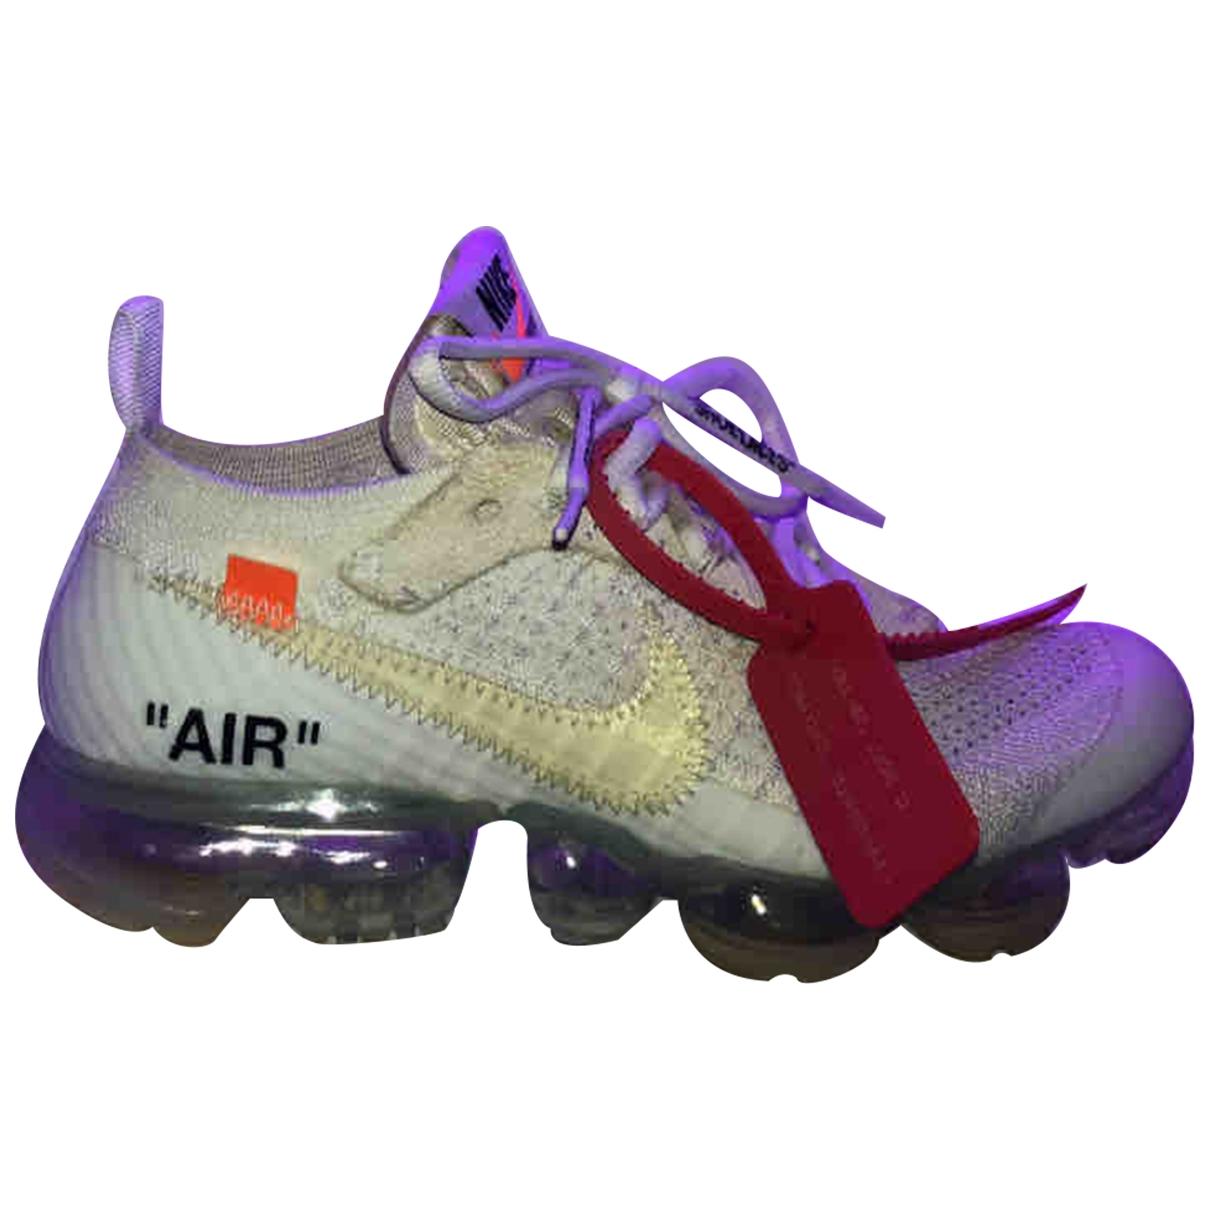 Deportivas Vapormax de Lona Nike X Off-white